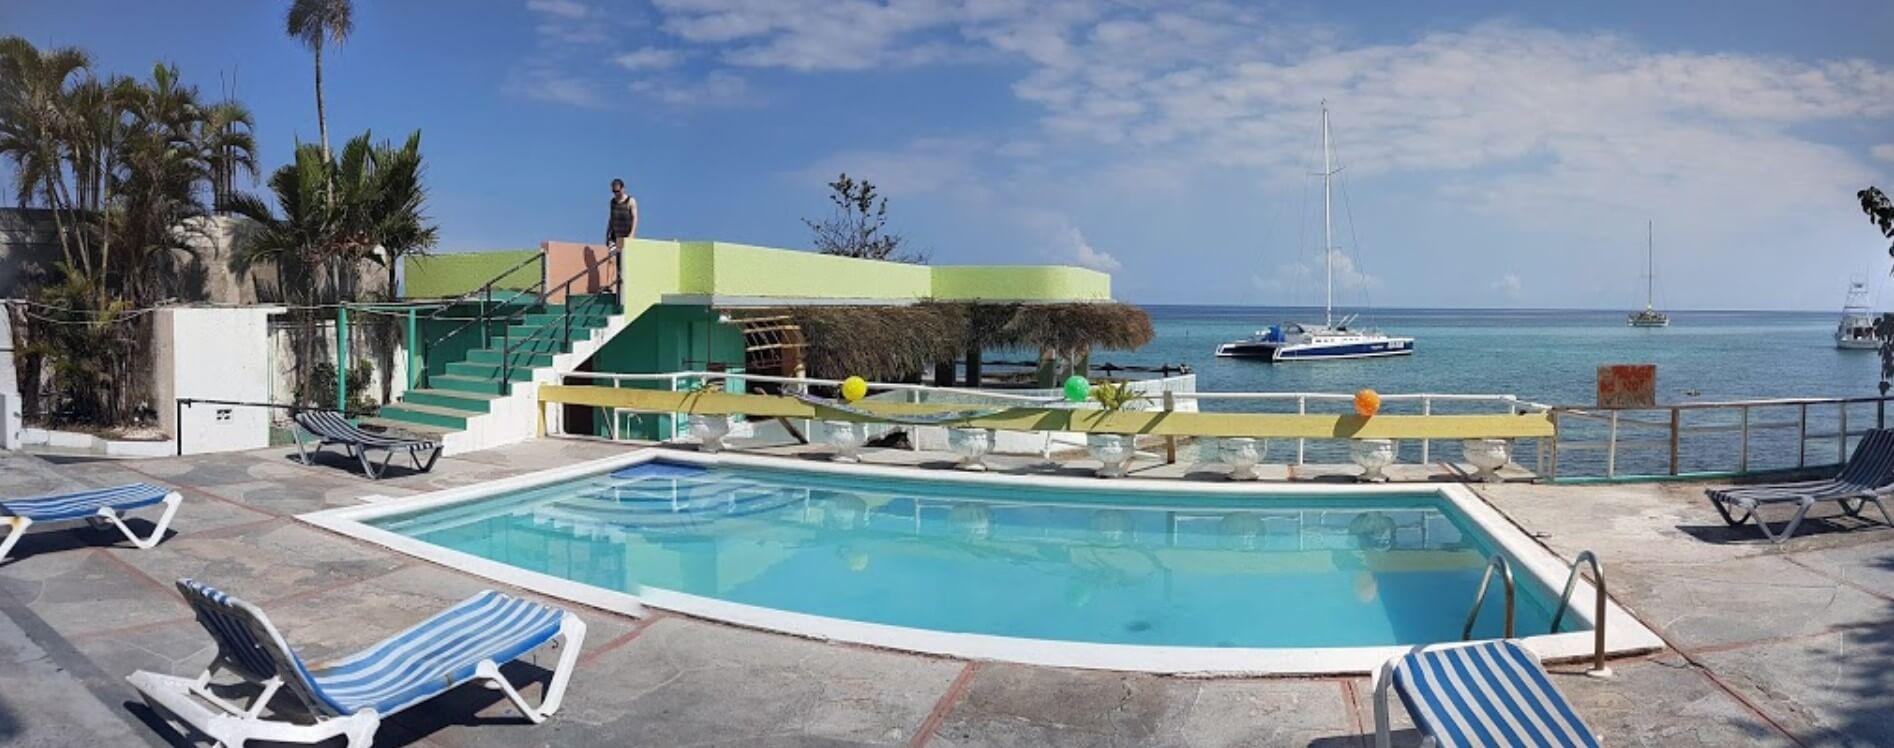 Ocean Sands – Ocean Palms – Jamaica